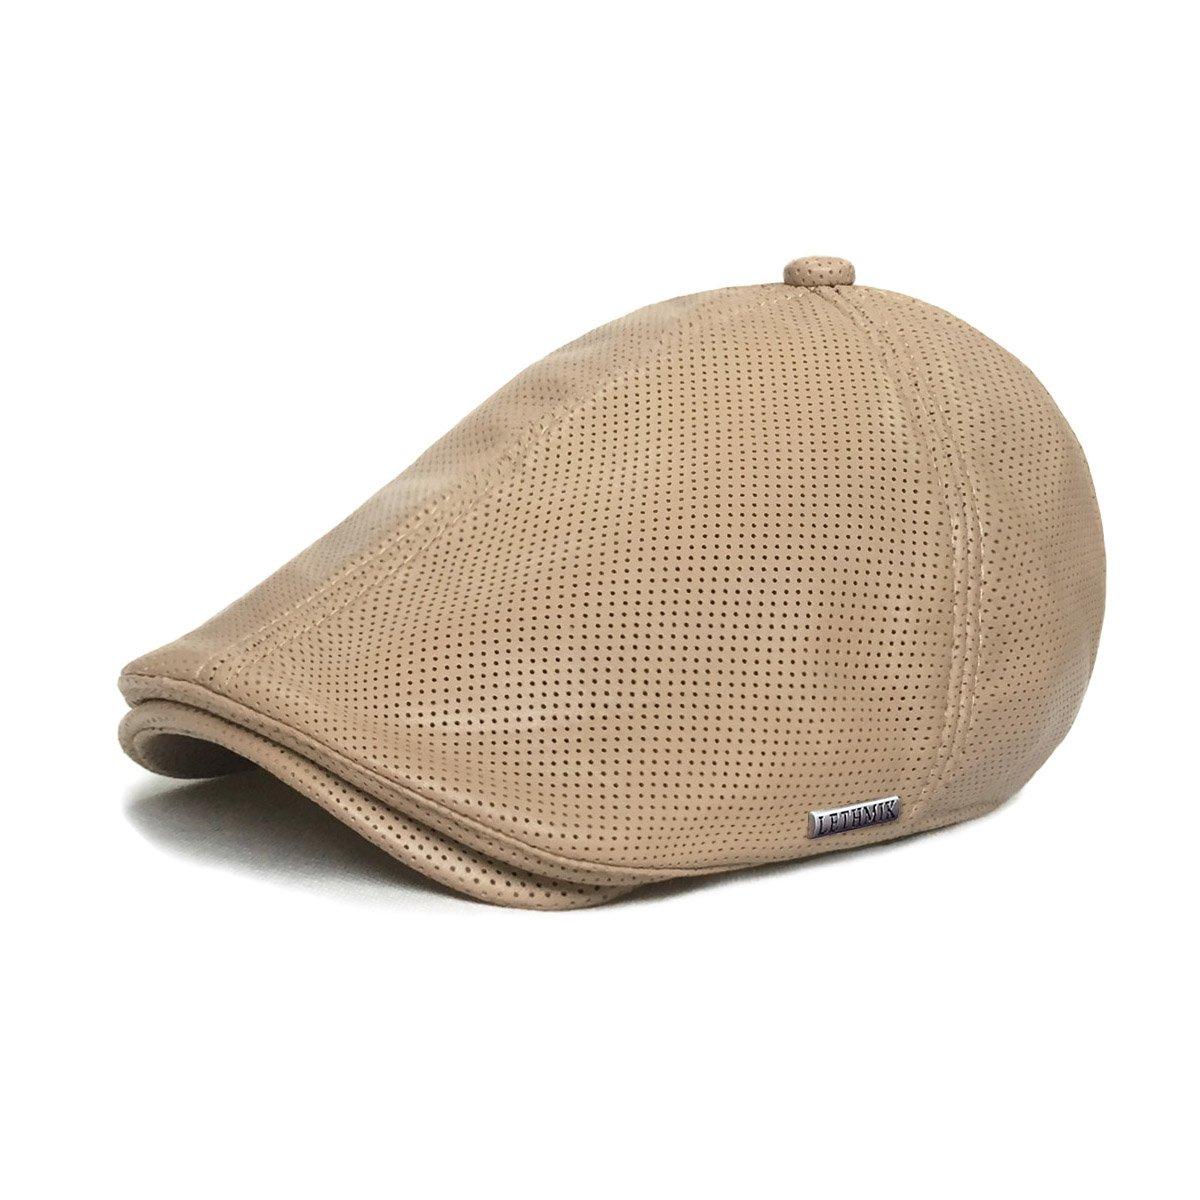 b4647c7c840 LETHMIK Vintage Flat Hat Ivy Irish Hats Gatsby Newsboy Cap Cabbie Hat  Stretch Beige Holes at Amazon Men s Clothing store